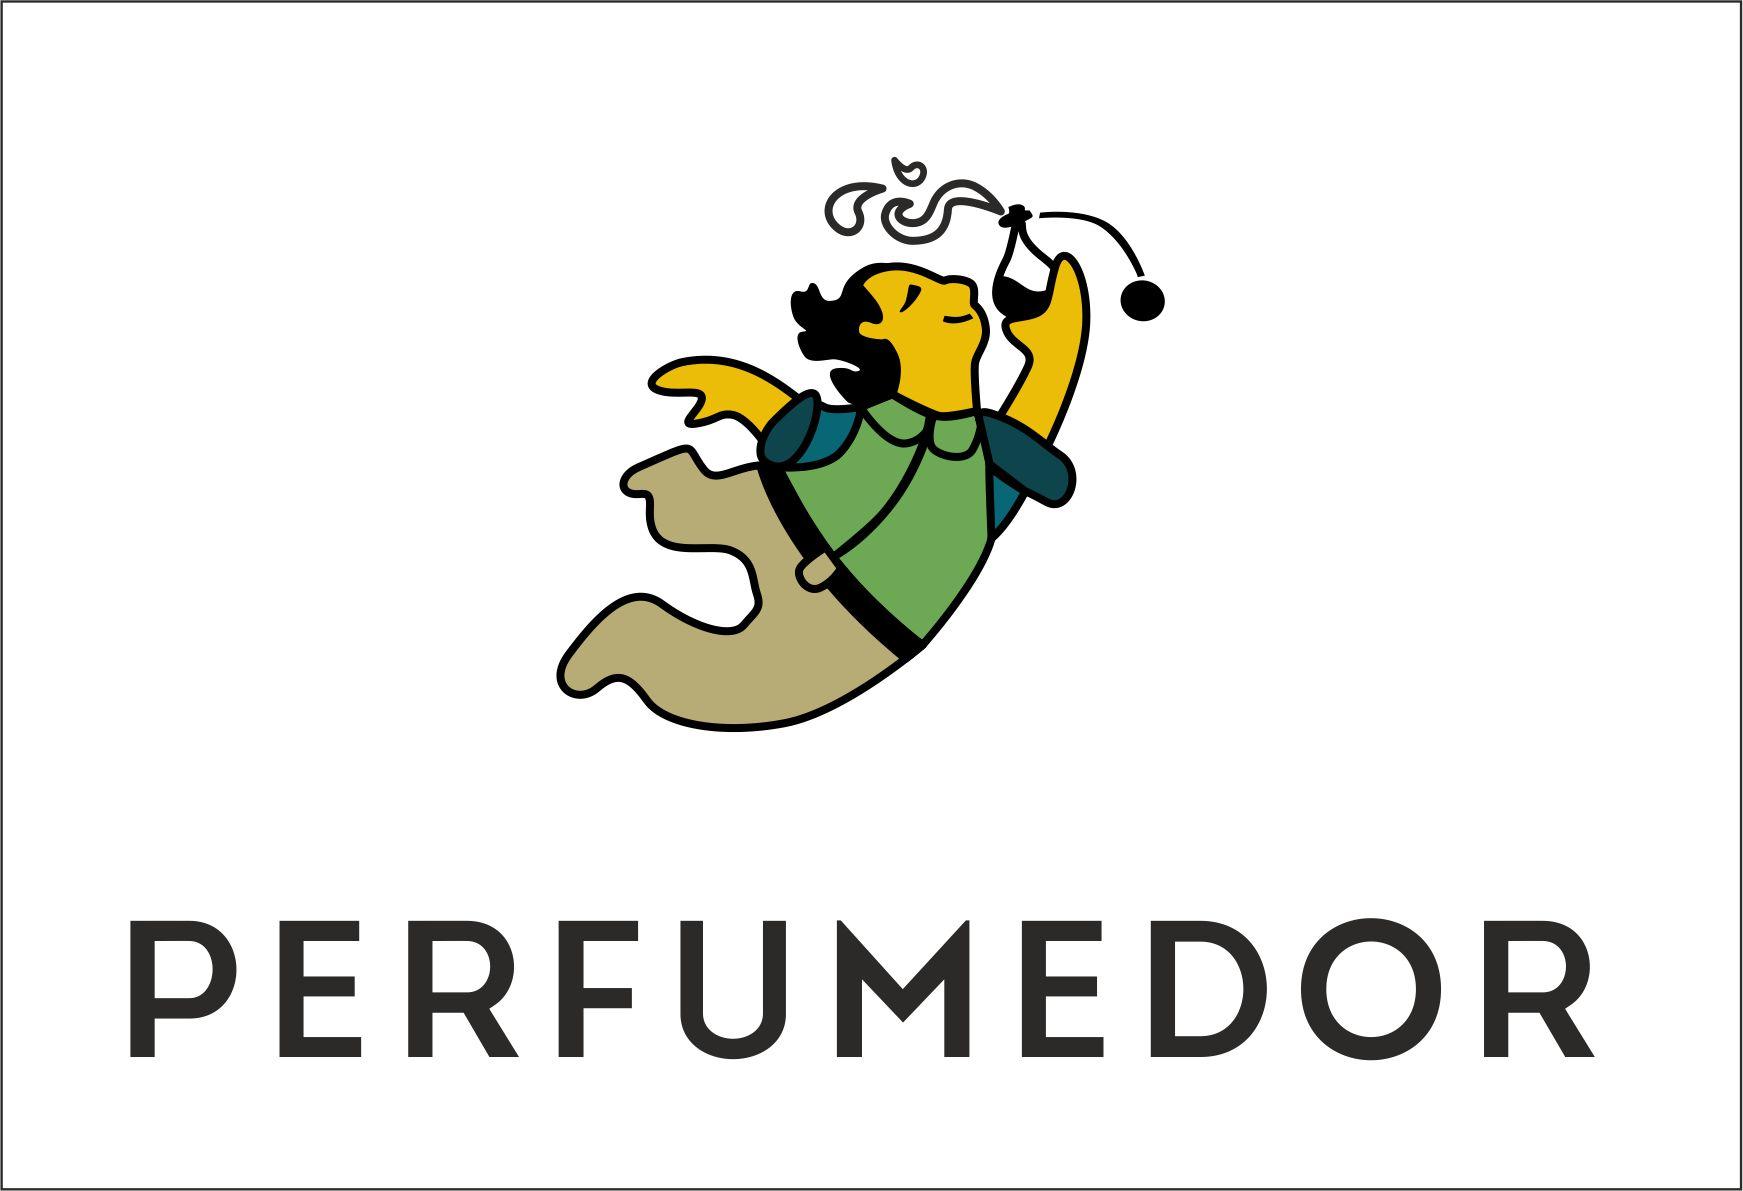 Логотип для интернет-магазина парфюмерии фото f_9705b48a51d18119.jpg